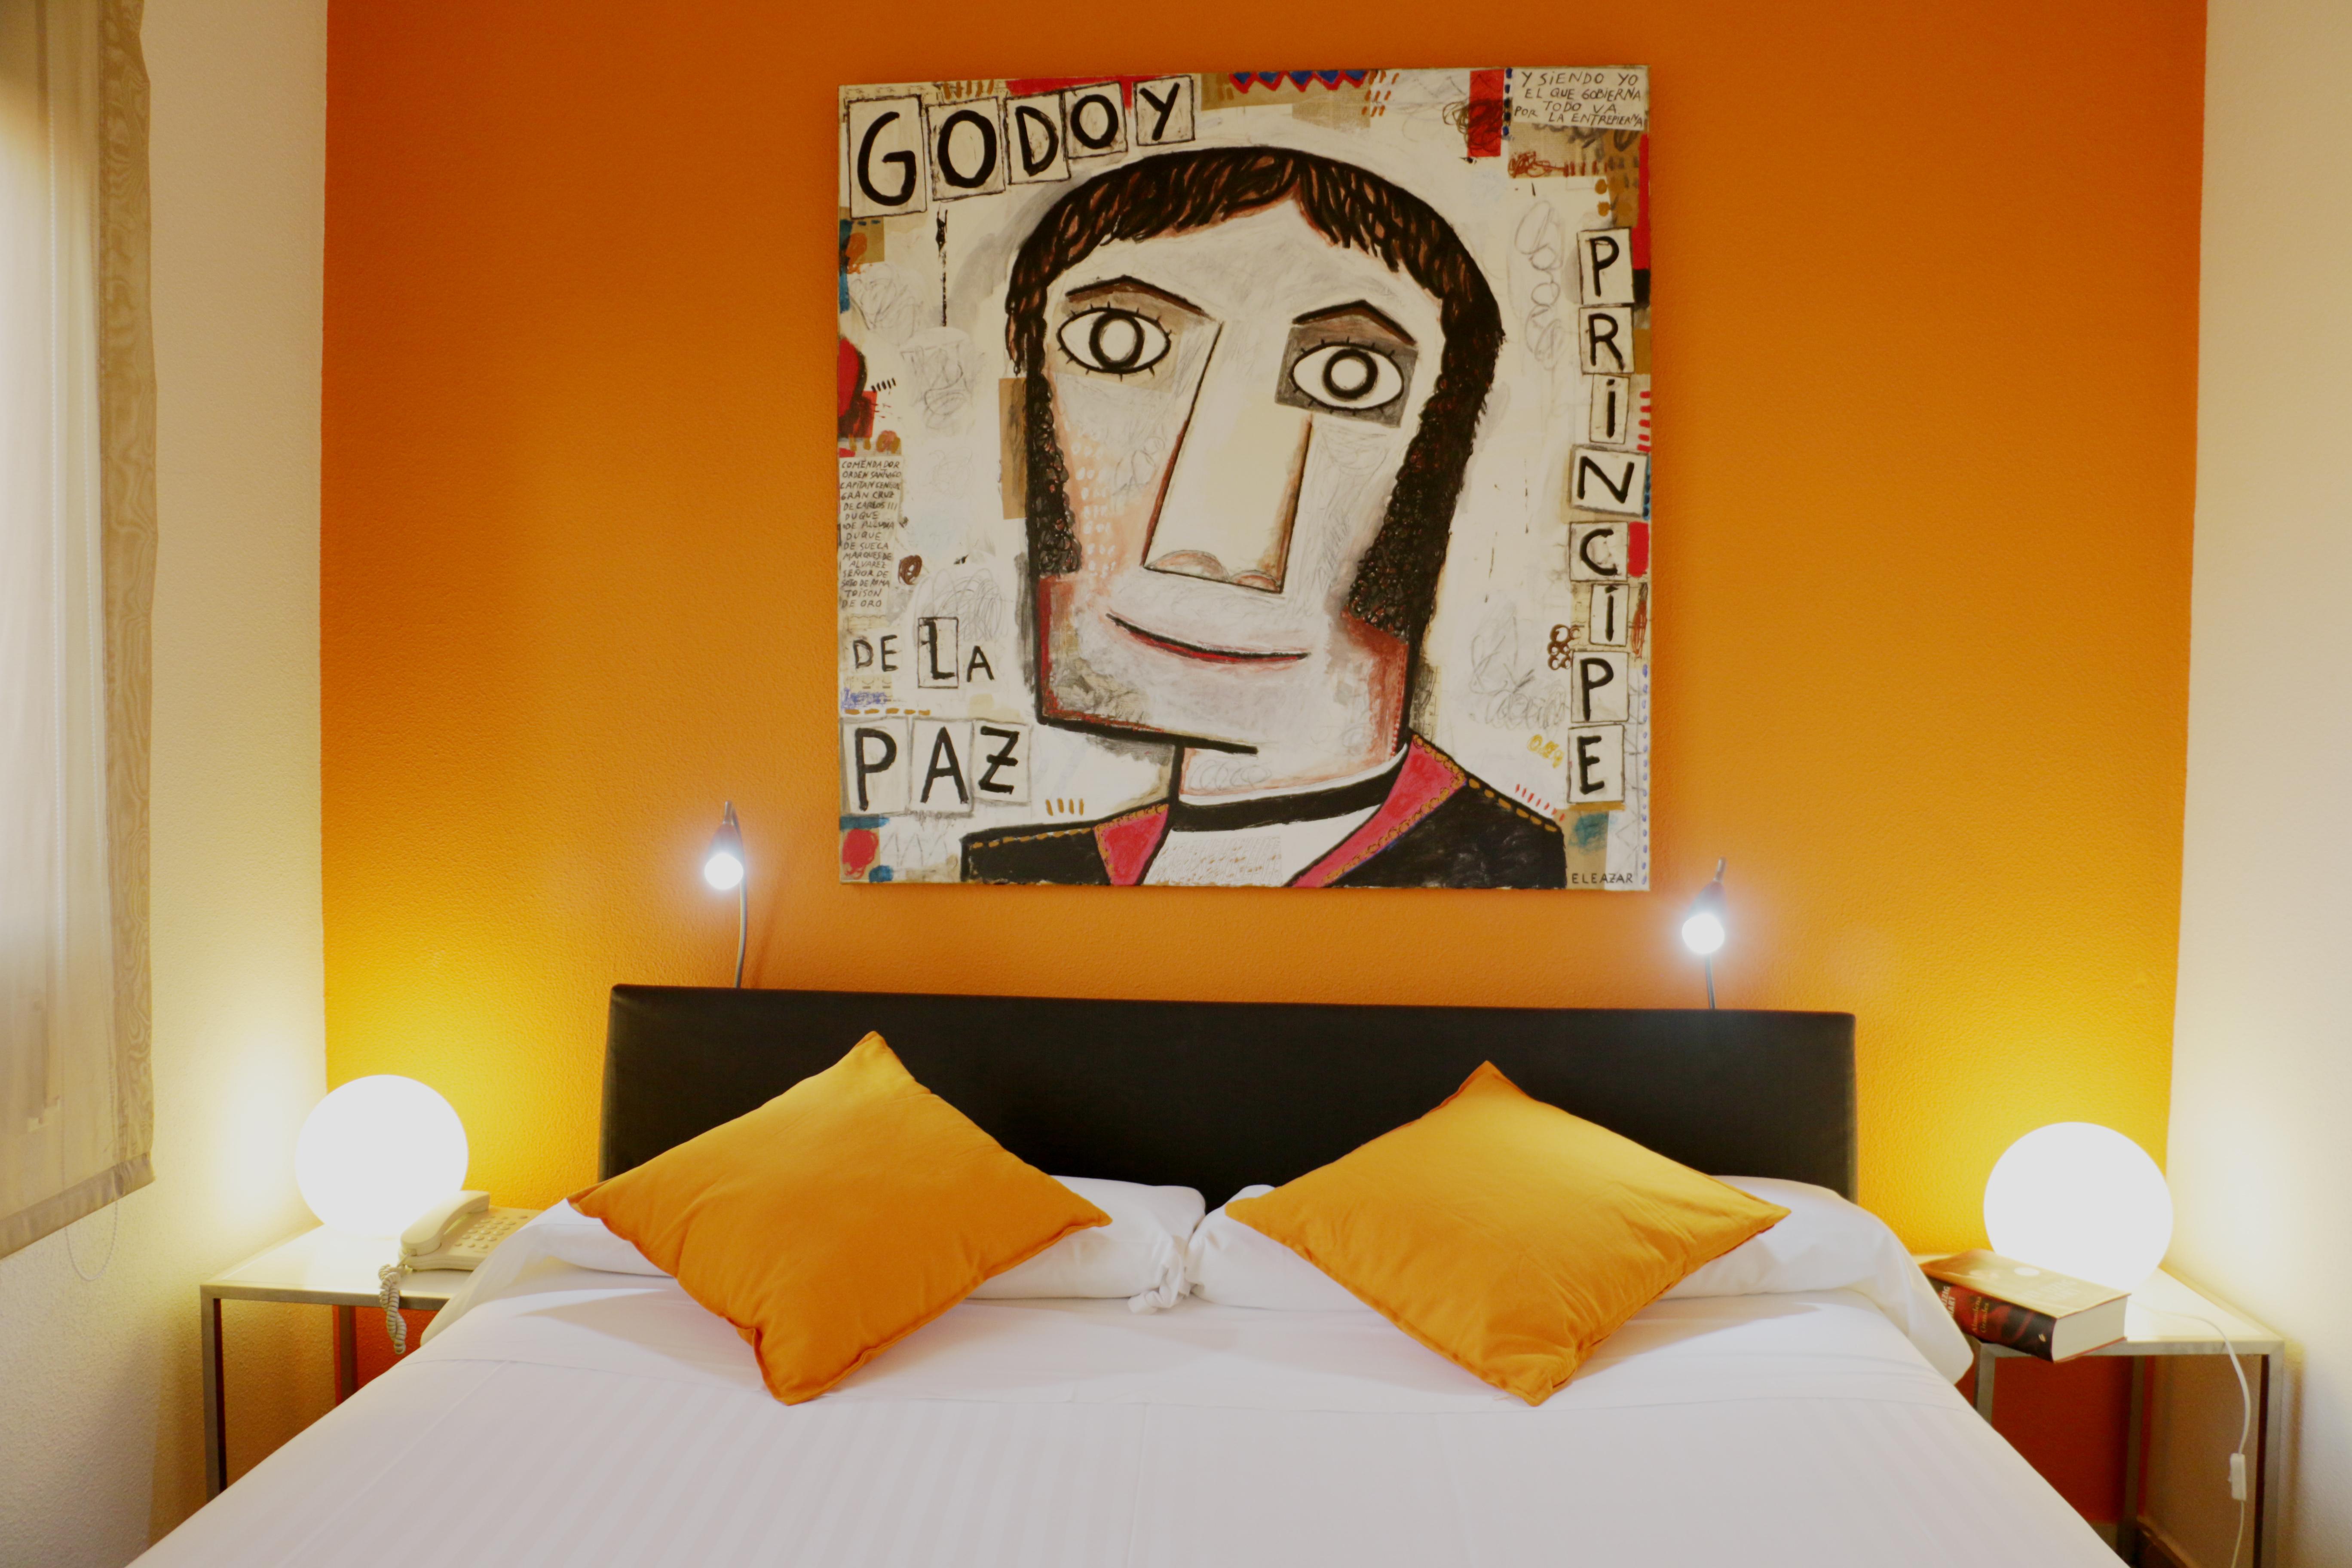 Apartamento superior dormitorio 1 cama